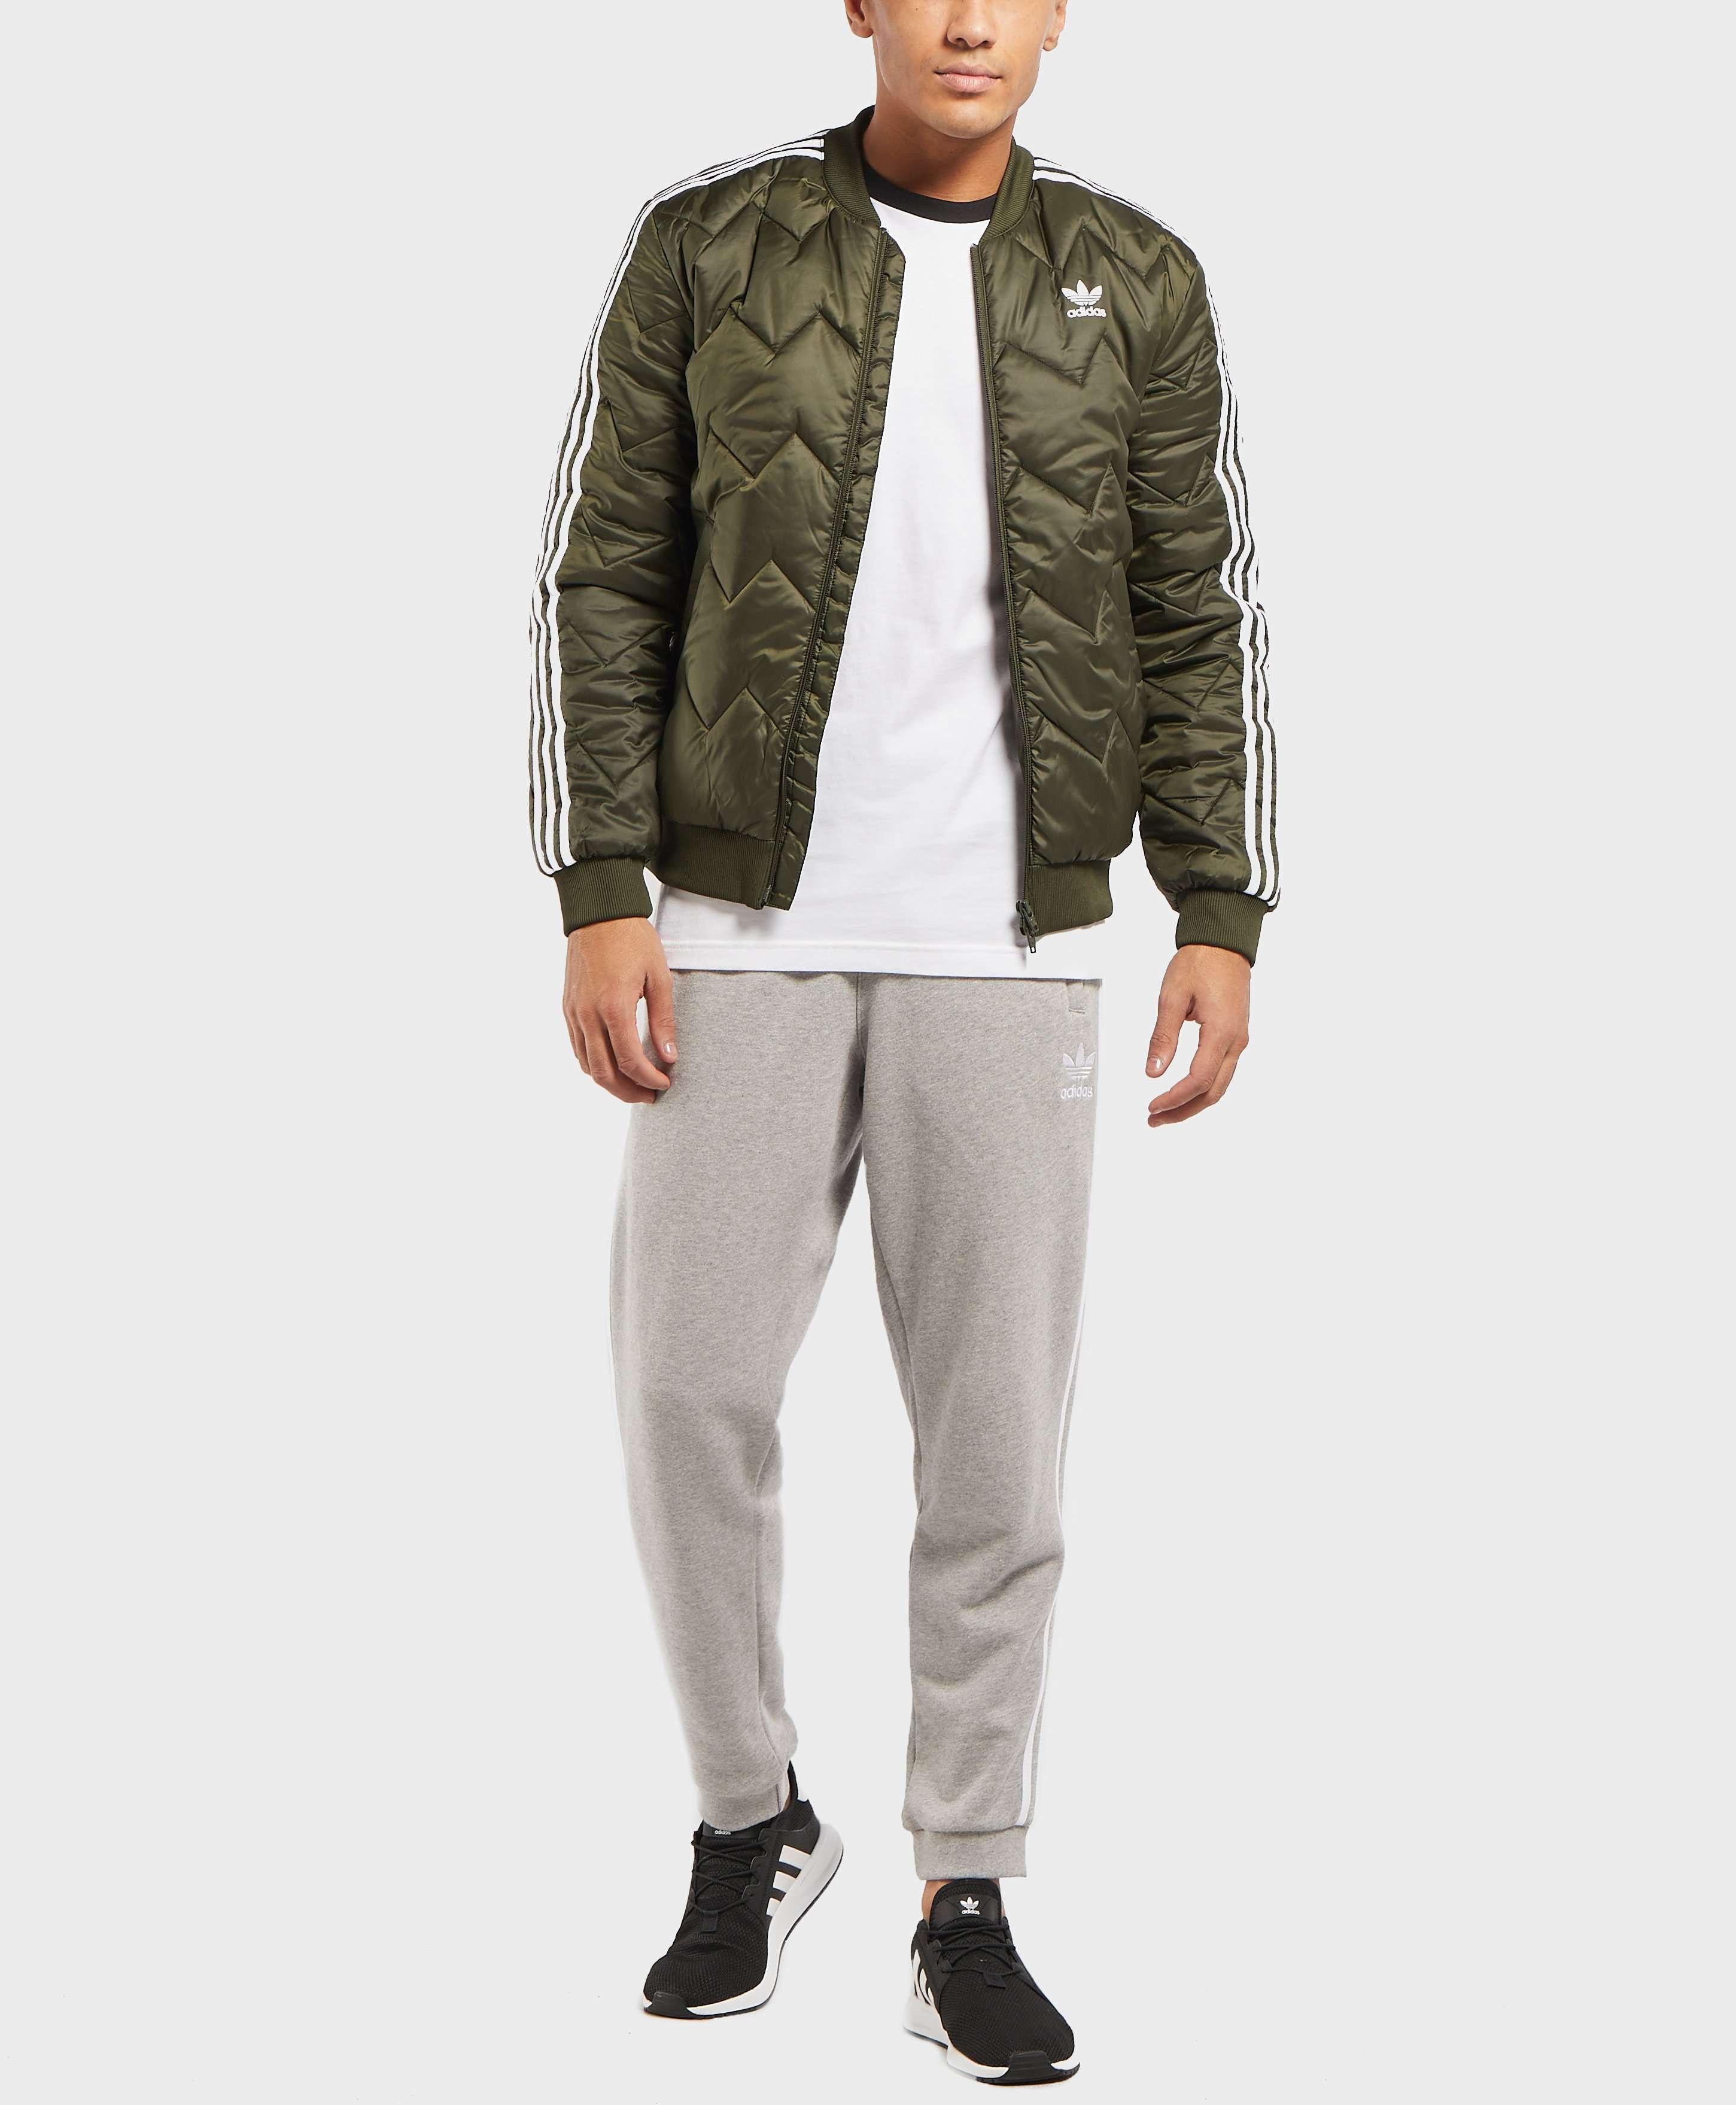 adidas Originals SST Quilted Bomber Jacket